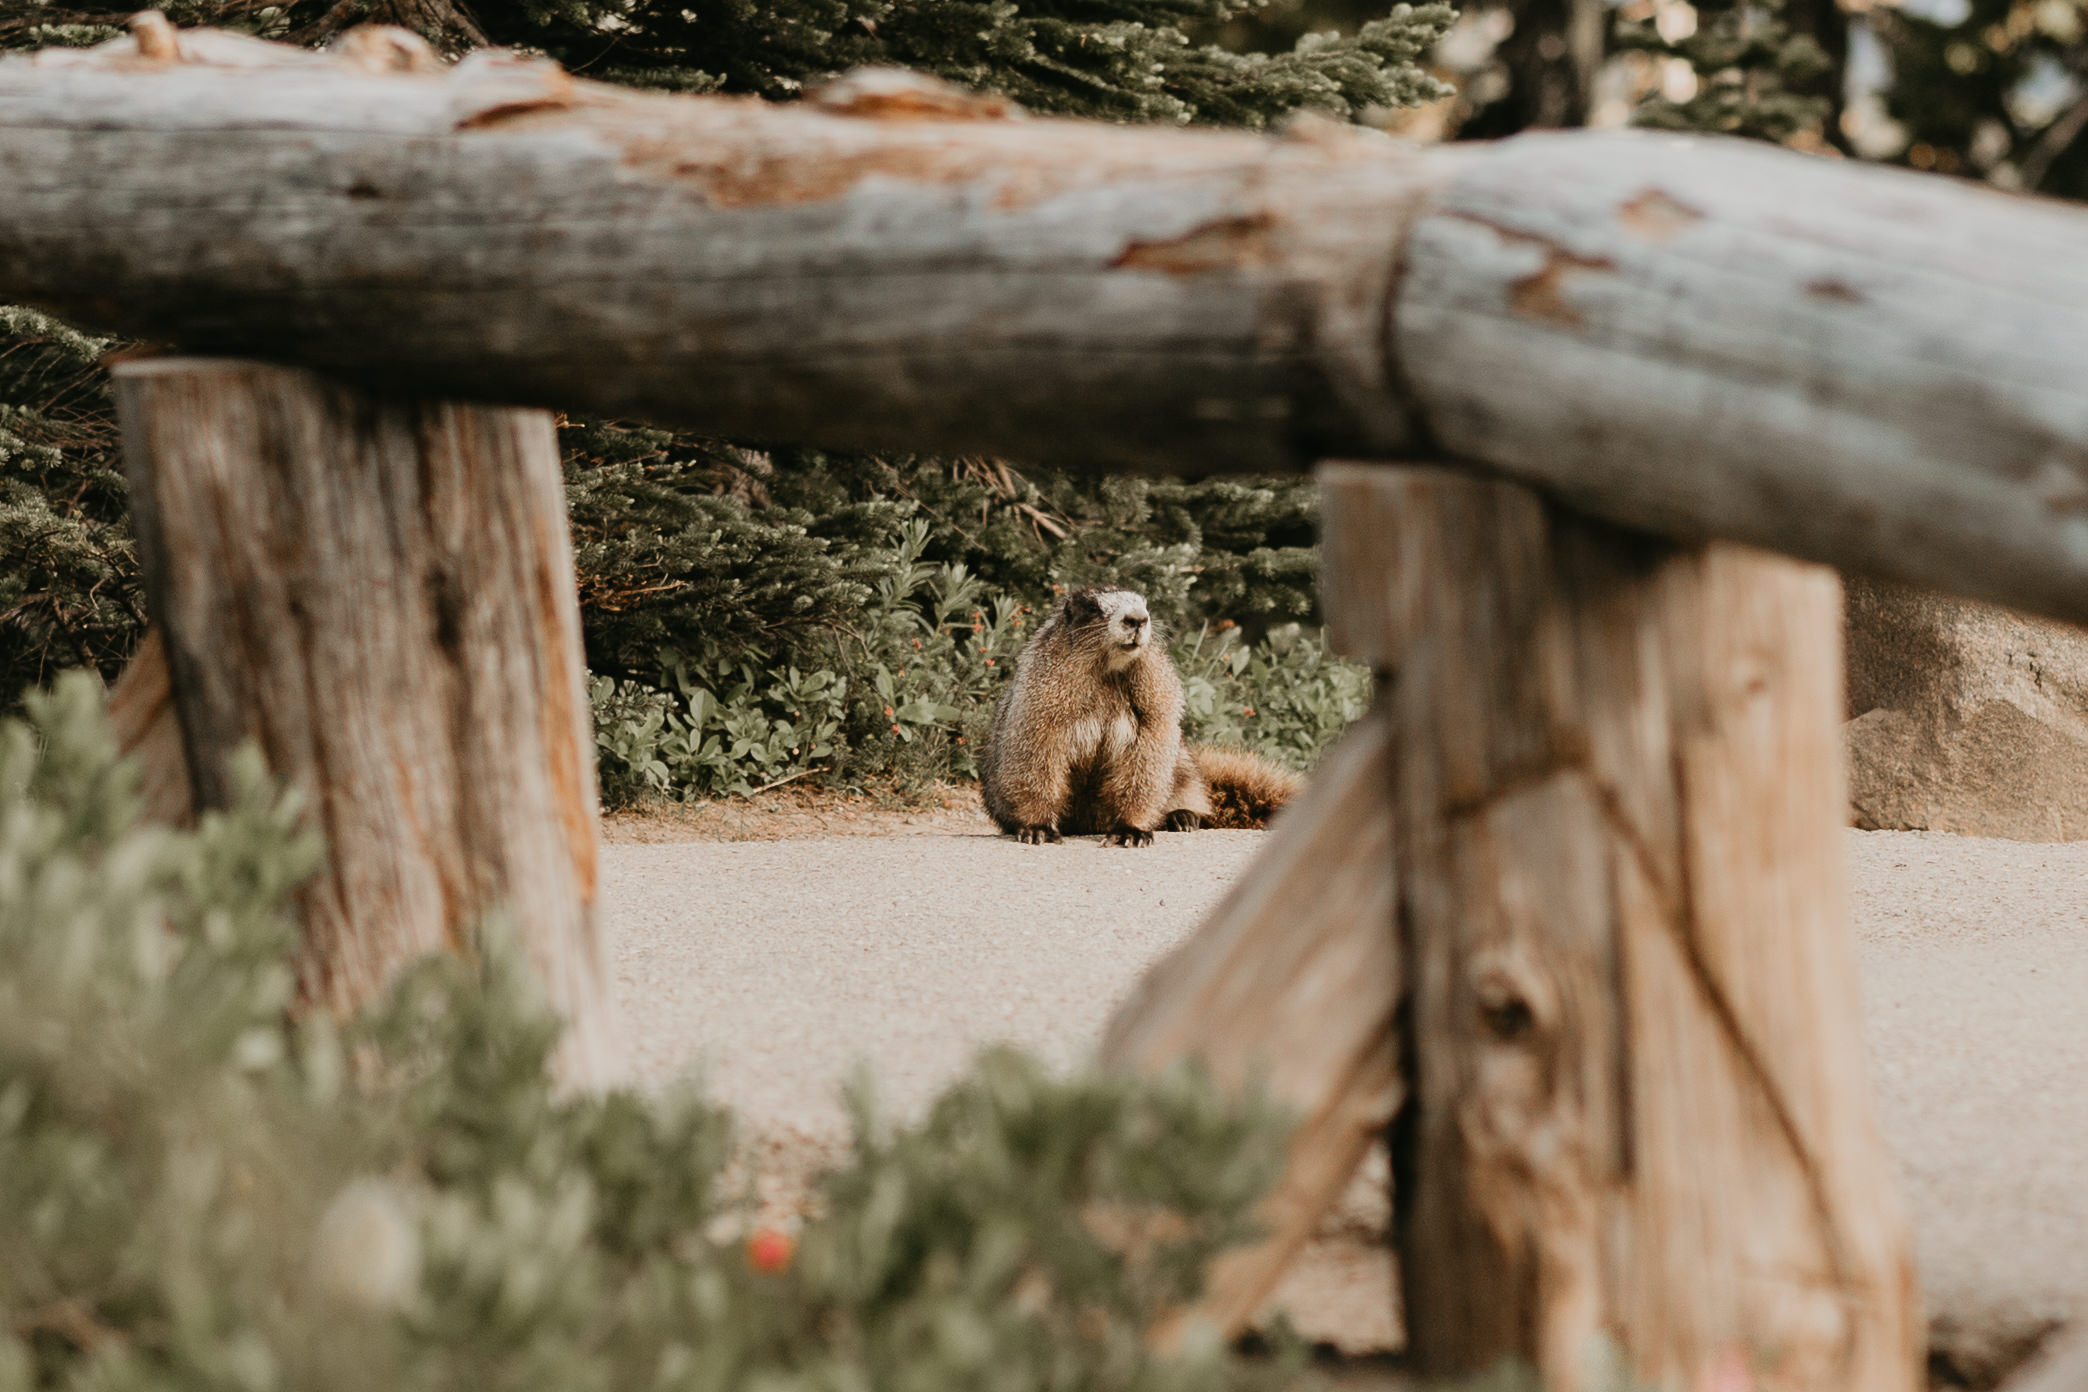 Nicole-Daacke-Photography-Mt-Rainier-elopement-photographer-washington-mountain-epic-wedding-photography-wildflowers-at-rainier-pine-tree-cloudy-summer-day-at-mountain-rainier-10.jpg